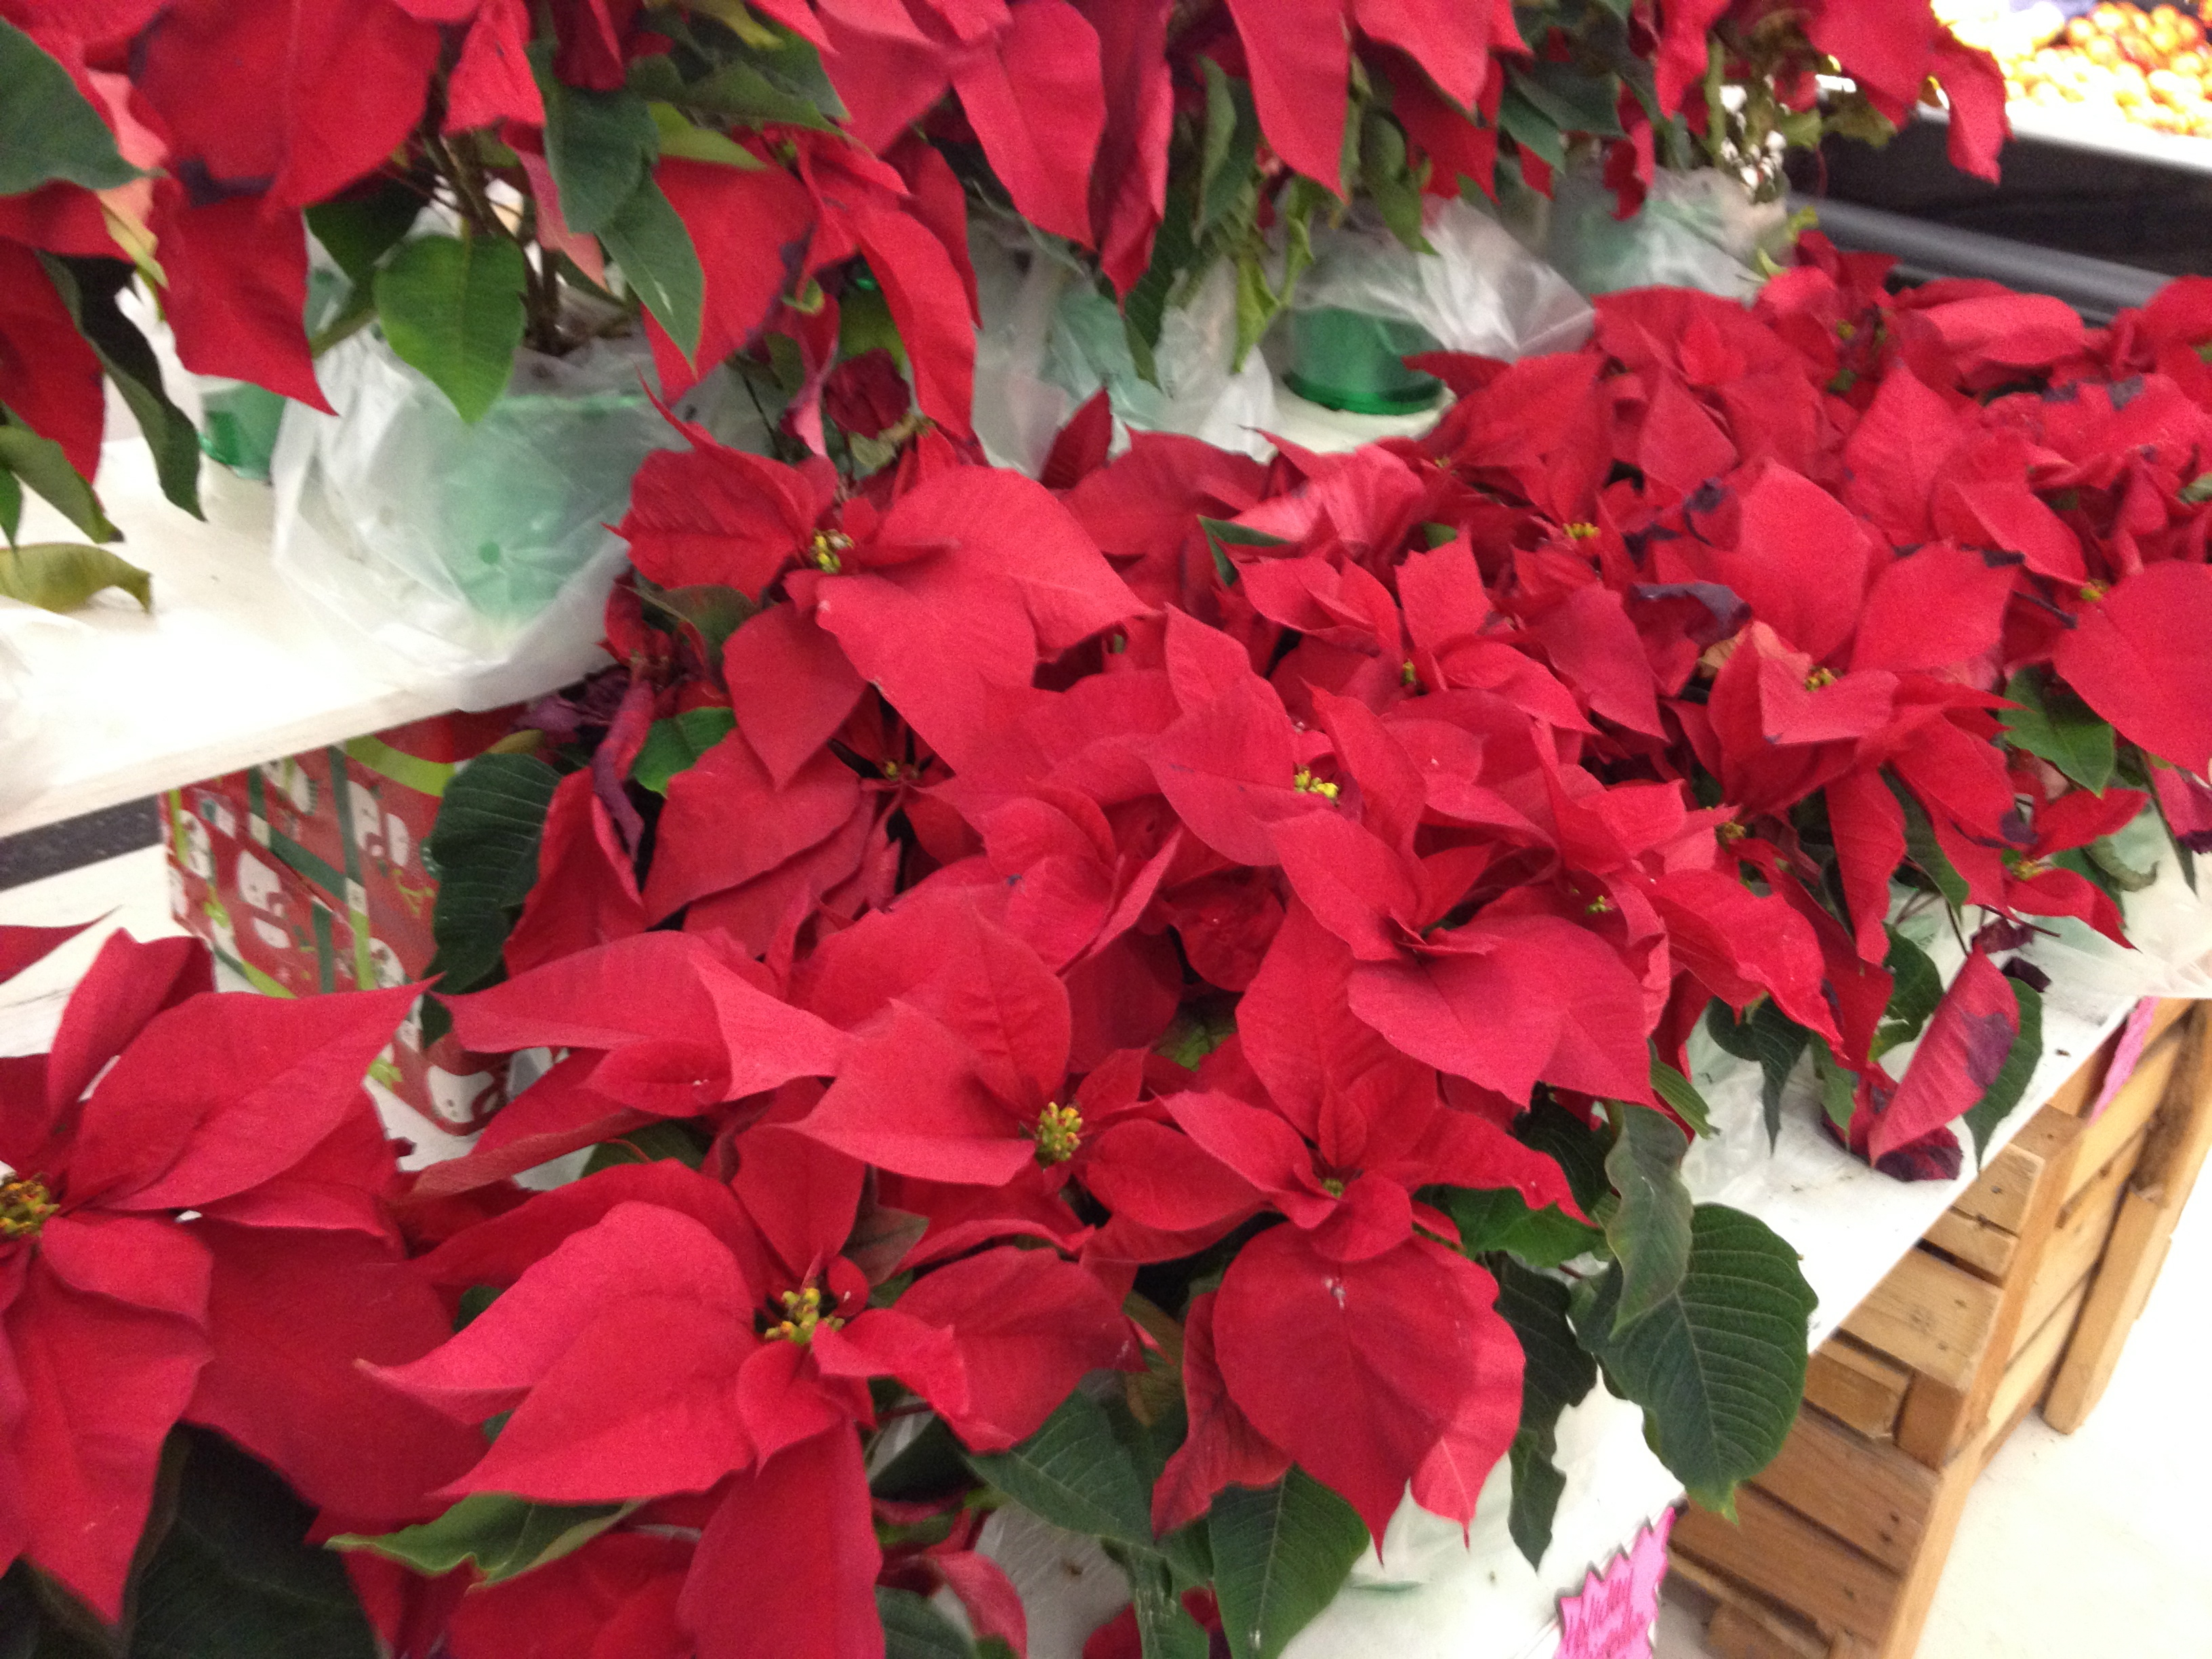 Day 18 – Random Act of Christmas Kindness – Nursing Home